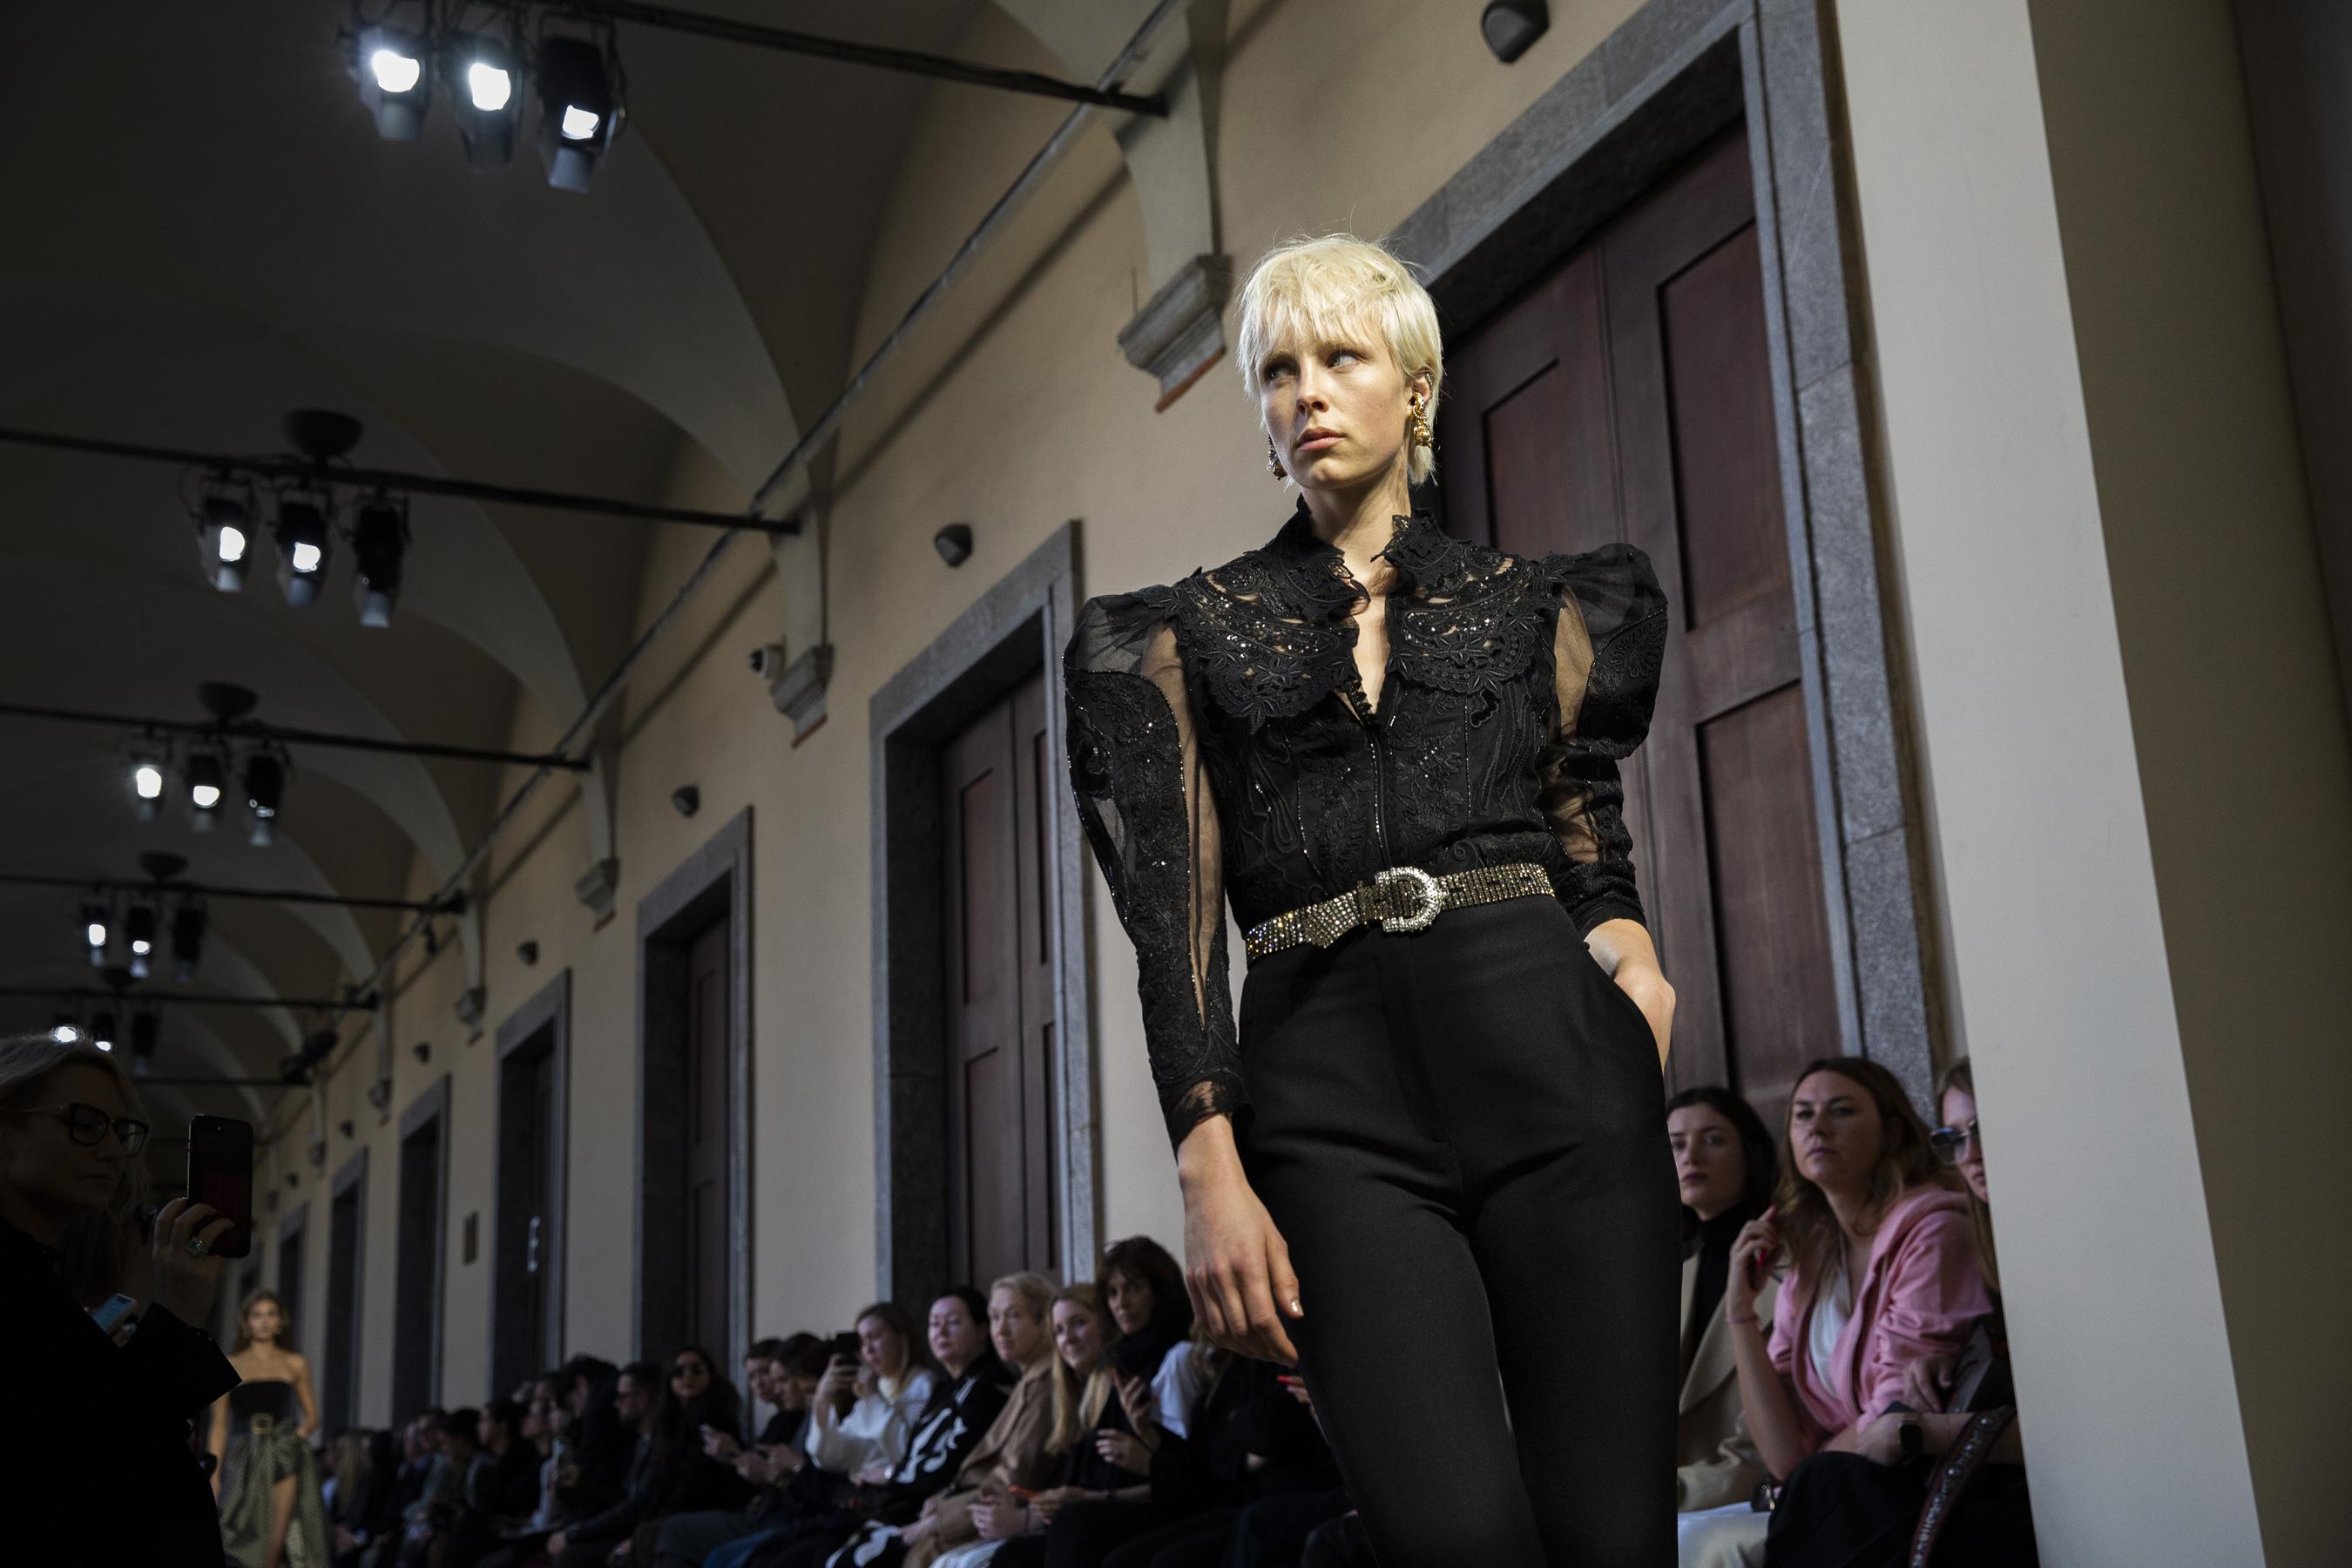 The Best of Photos Milan Fashion Week Fall 2019